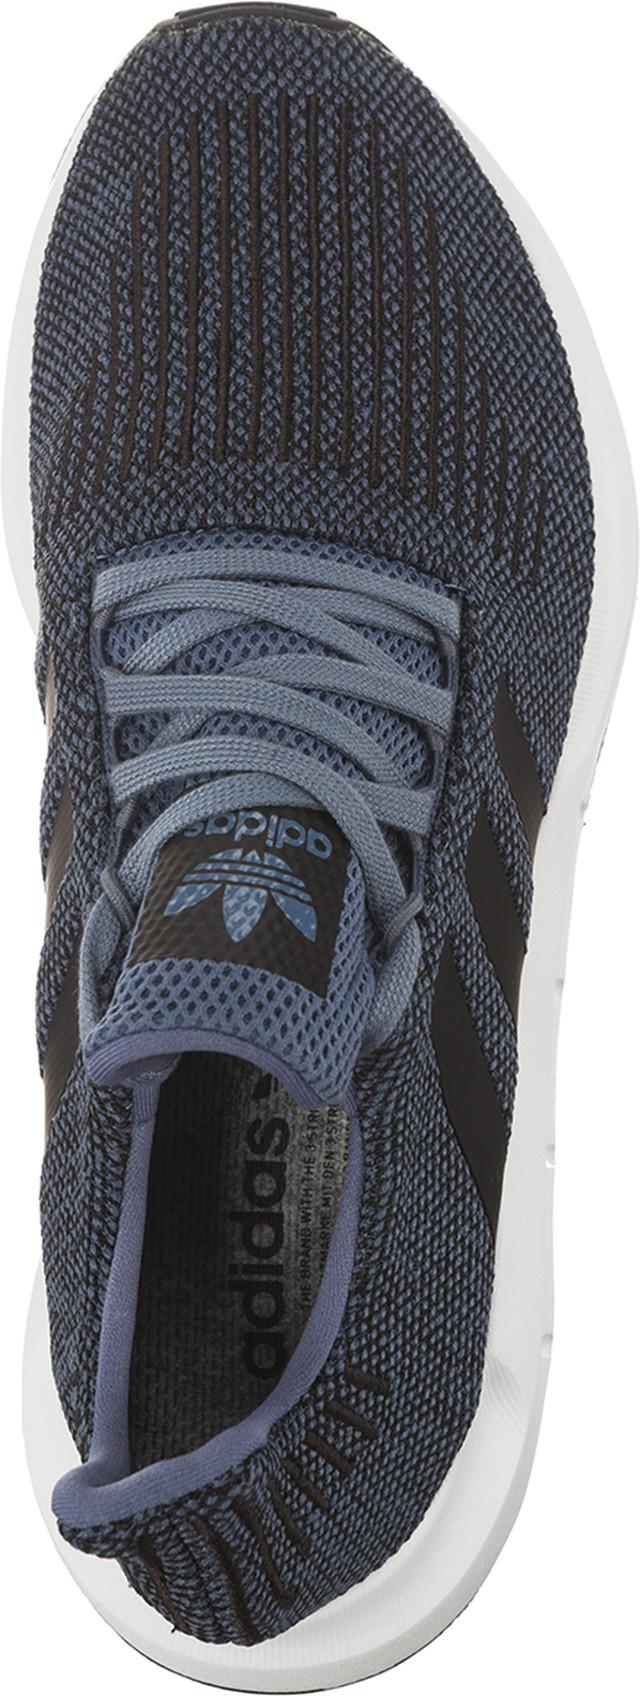 e166bc769 Buty adidas SWIFT RUN 120 RAW STEEL CORE BLACK FOOTWEAR WHITE ...